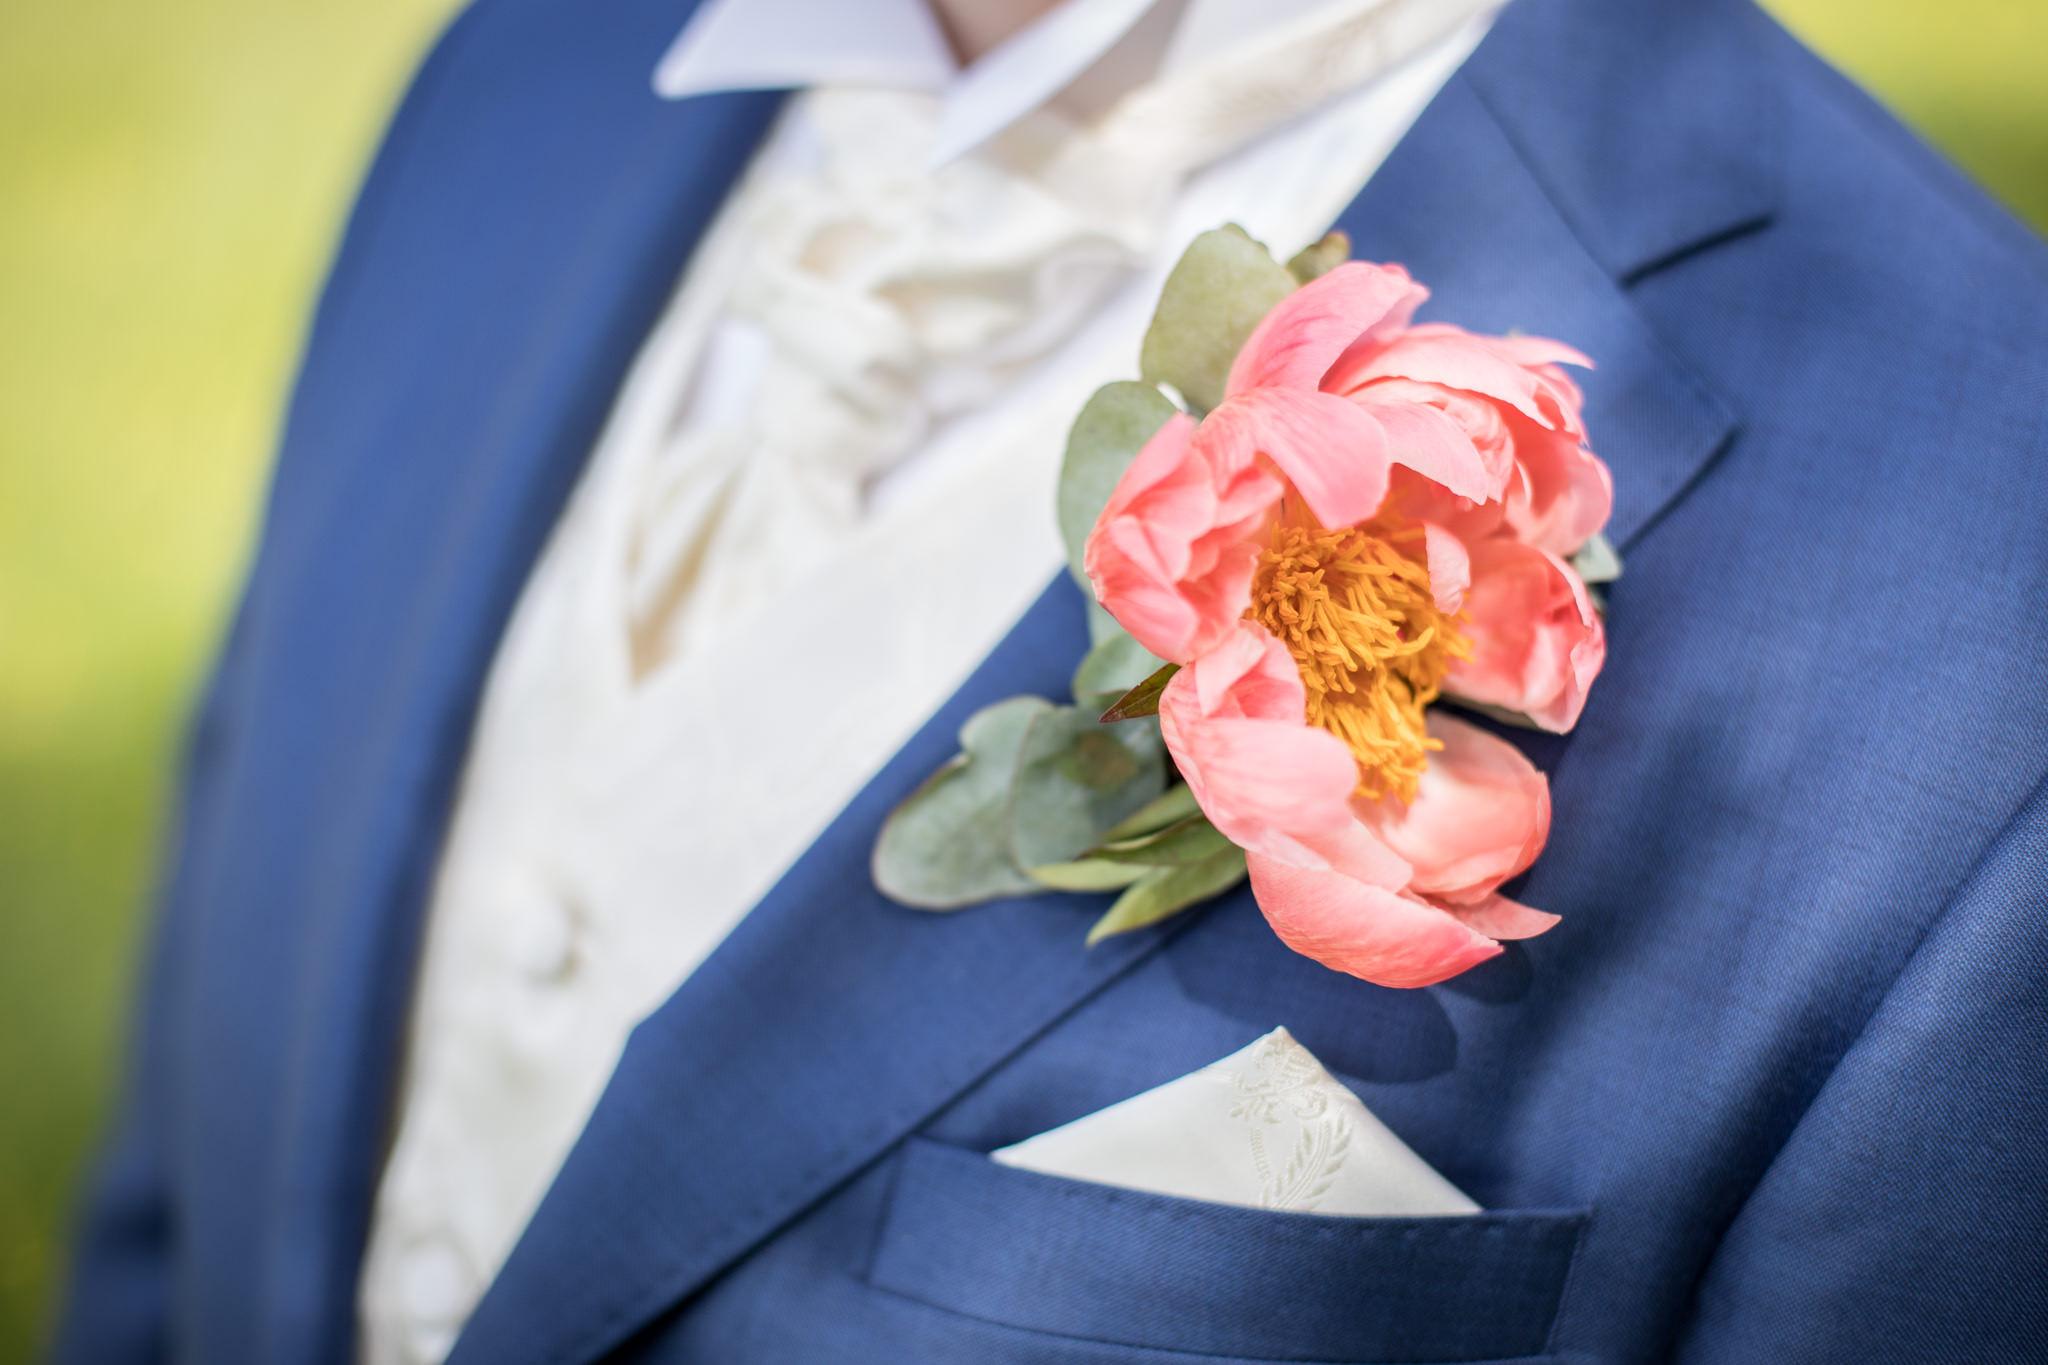 Crousage pion rosa